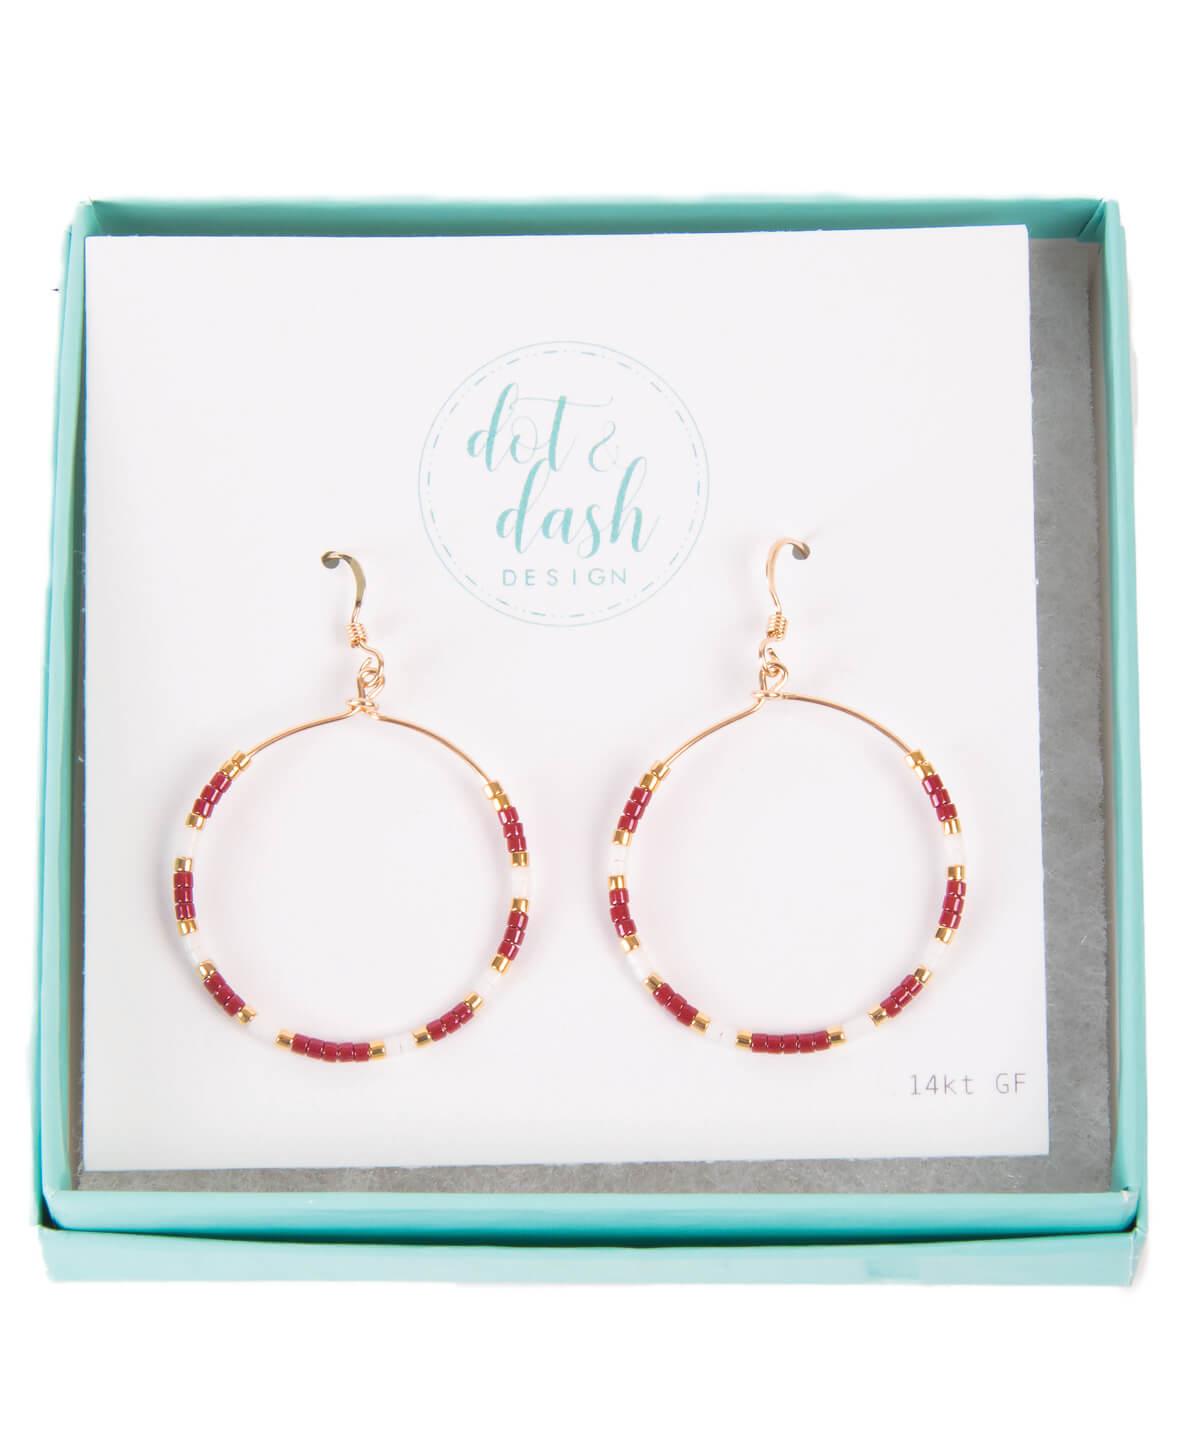 Dot And Dash Design Maroon White Morse Code Hoop Earrings